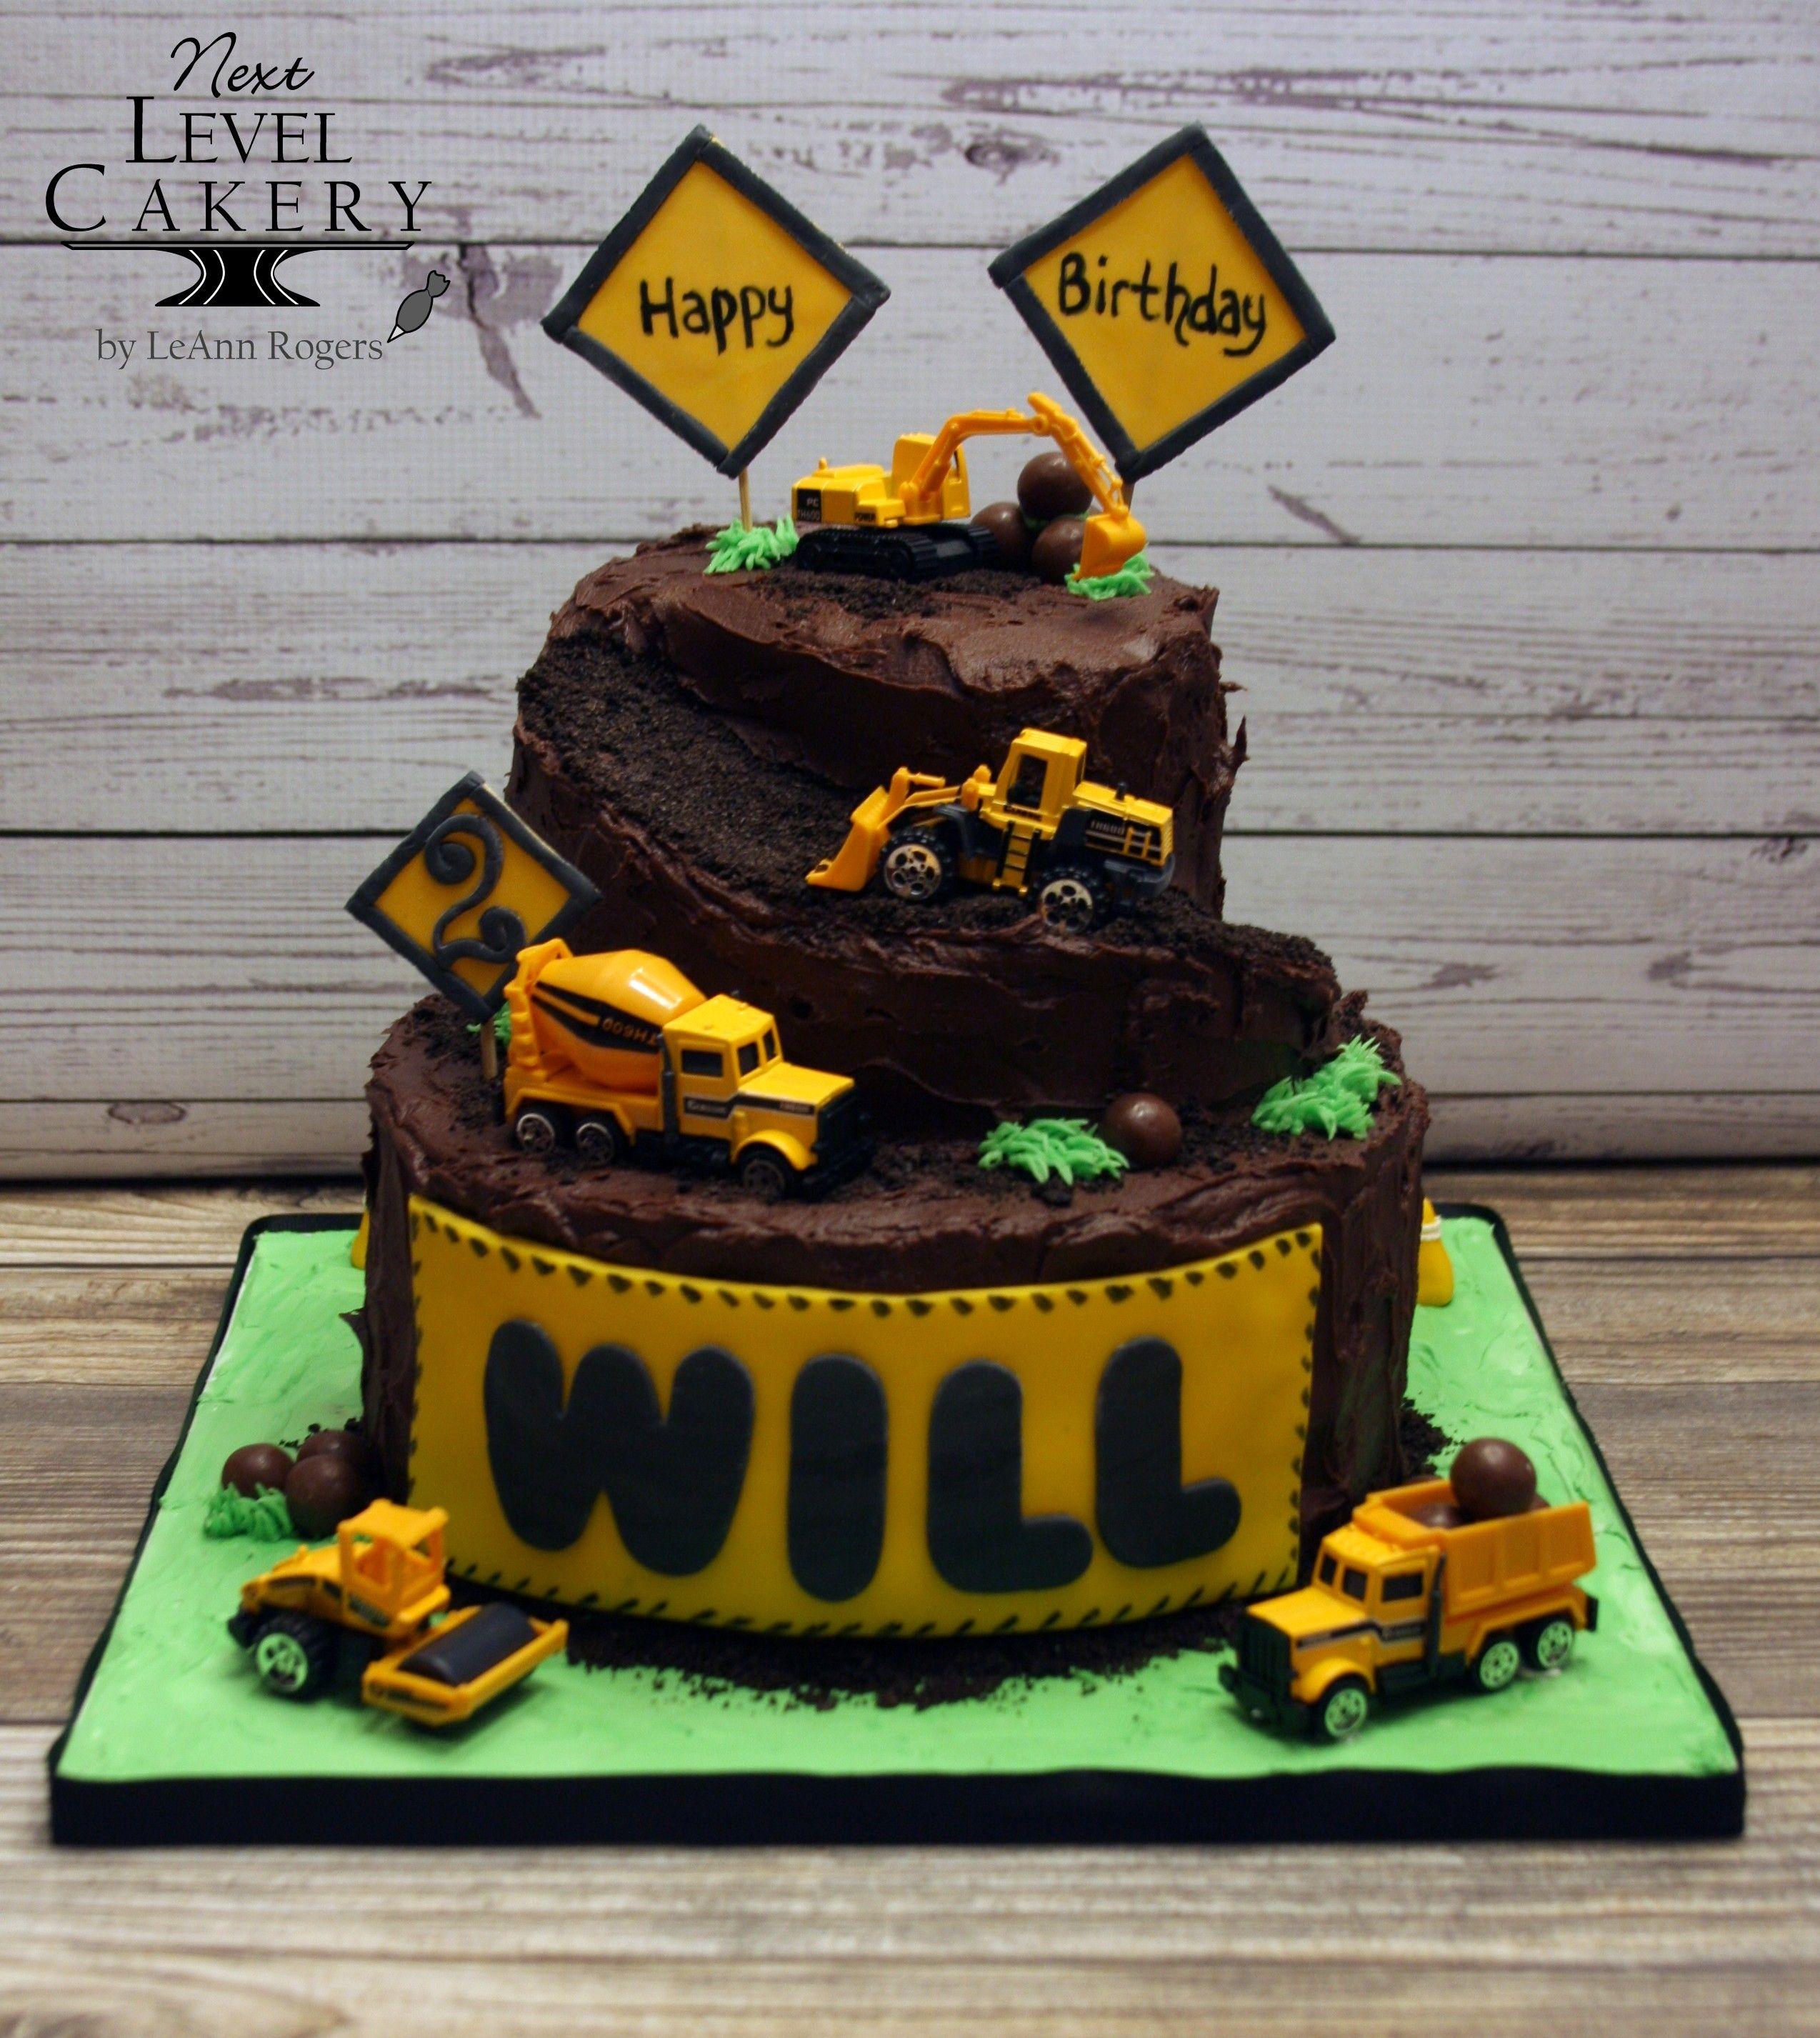 Remarkable Construction Cake 2 Year Old Boy Cake Chocolate Cake Ramp Cake Birthday Cards Printable Inklcafe Filternl